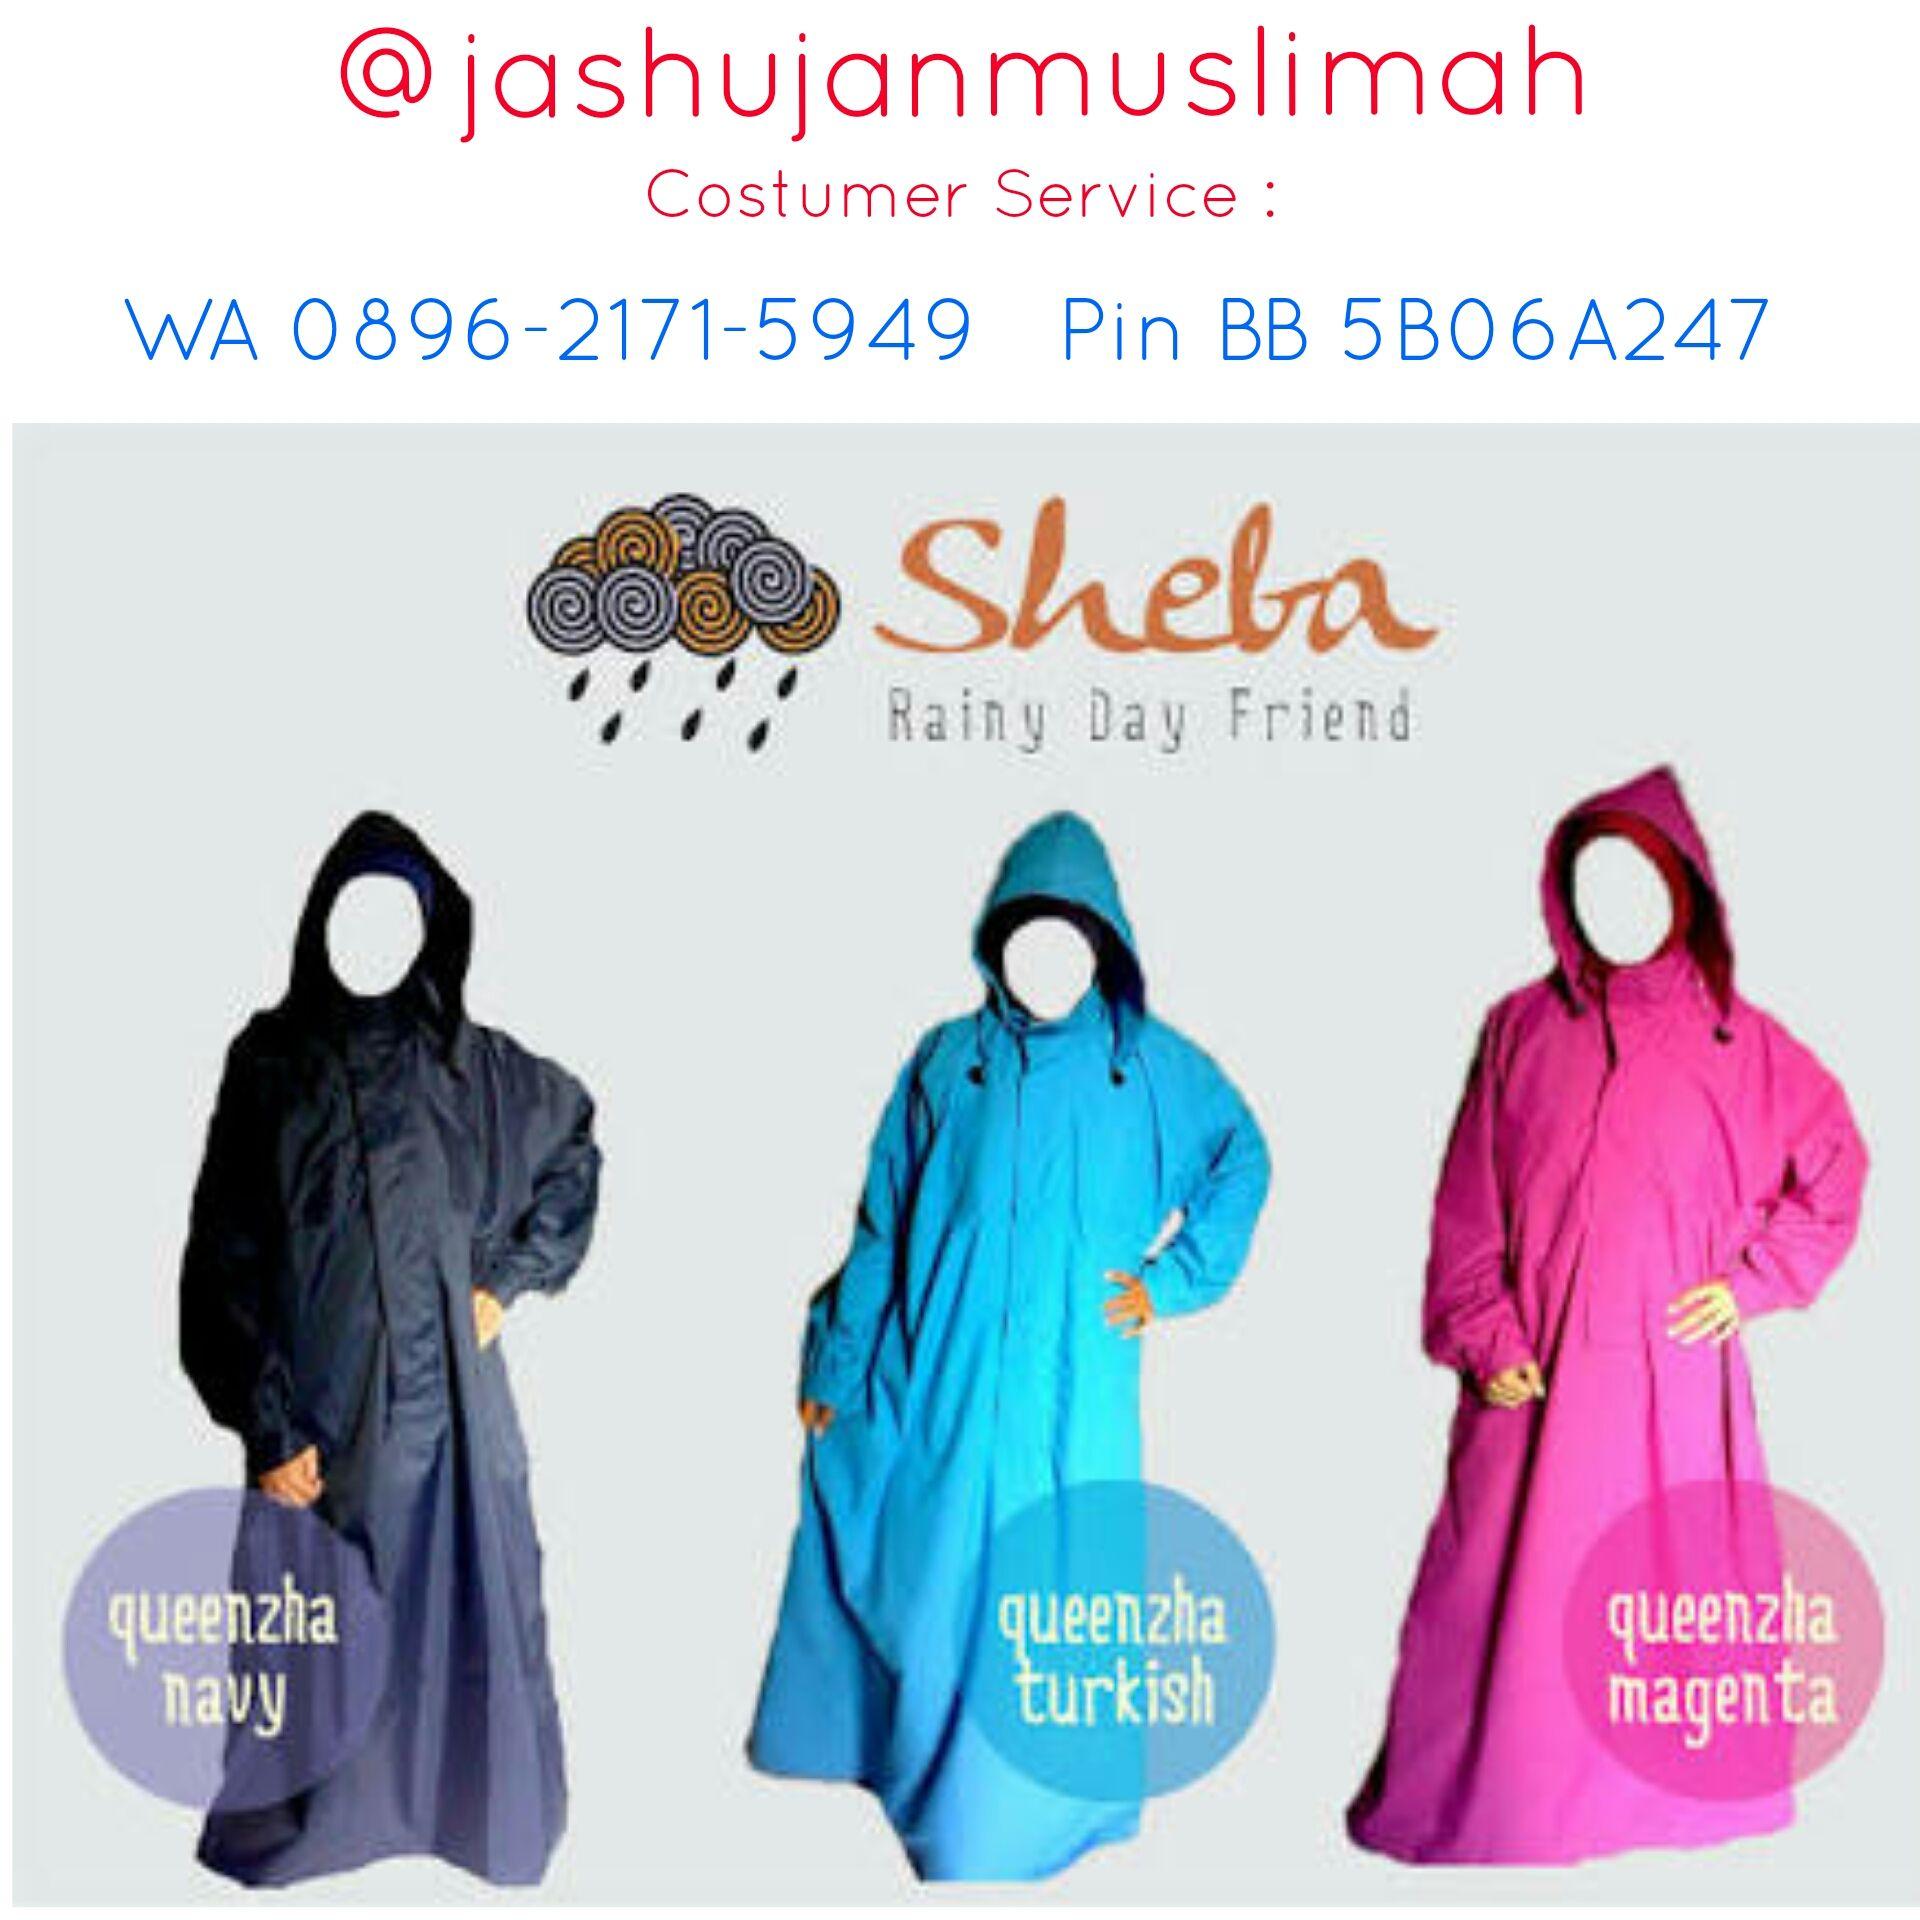 Penjual Jas Hujan, Grosir Jas Hujan Muslimah, Distrib